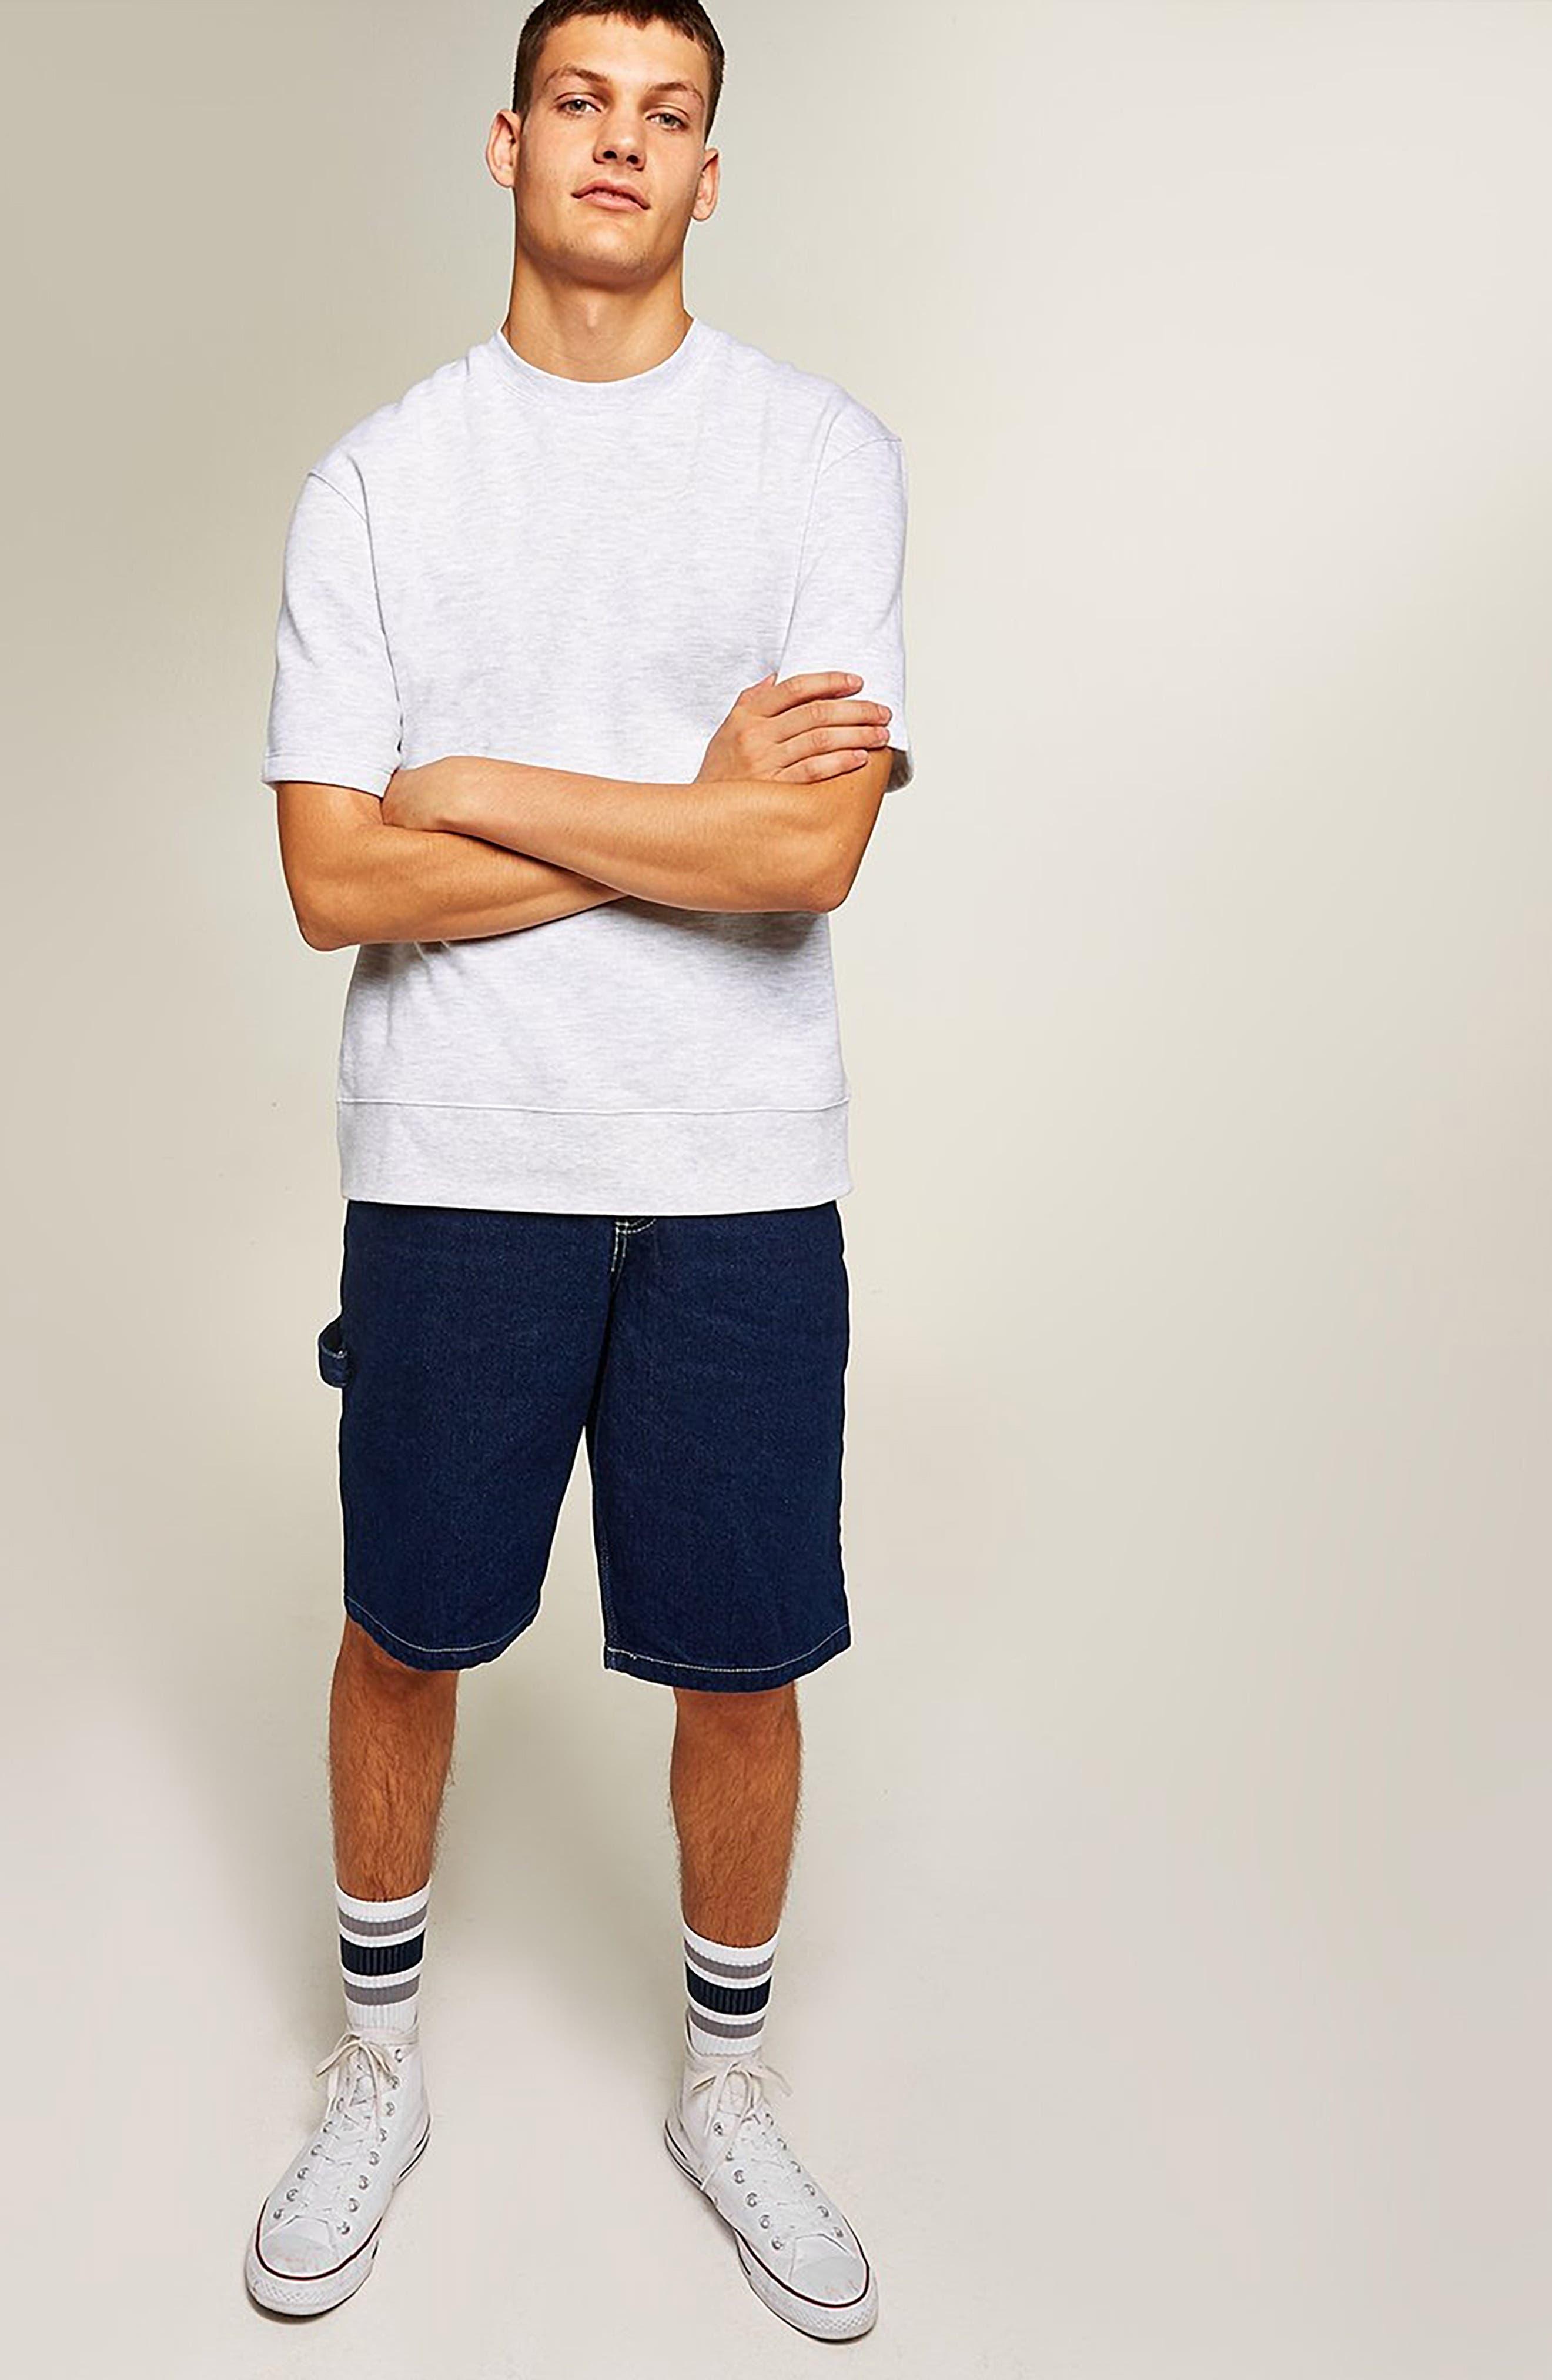 Short Sleeve Crewneck Sweatshirt,                             Alternate thumbnail 5, color,                             LIGHT GREY